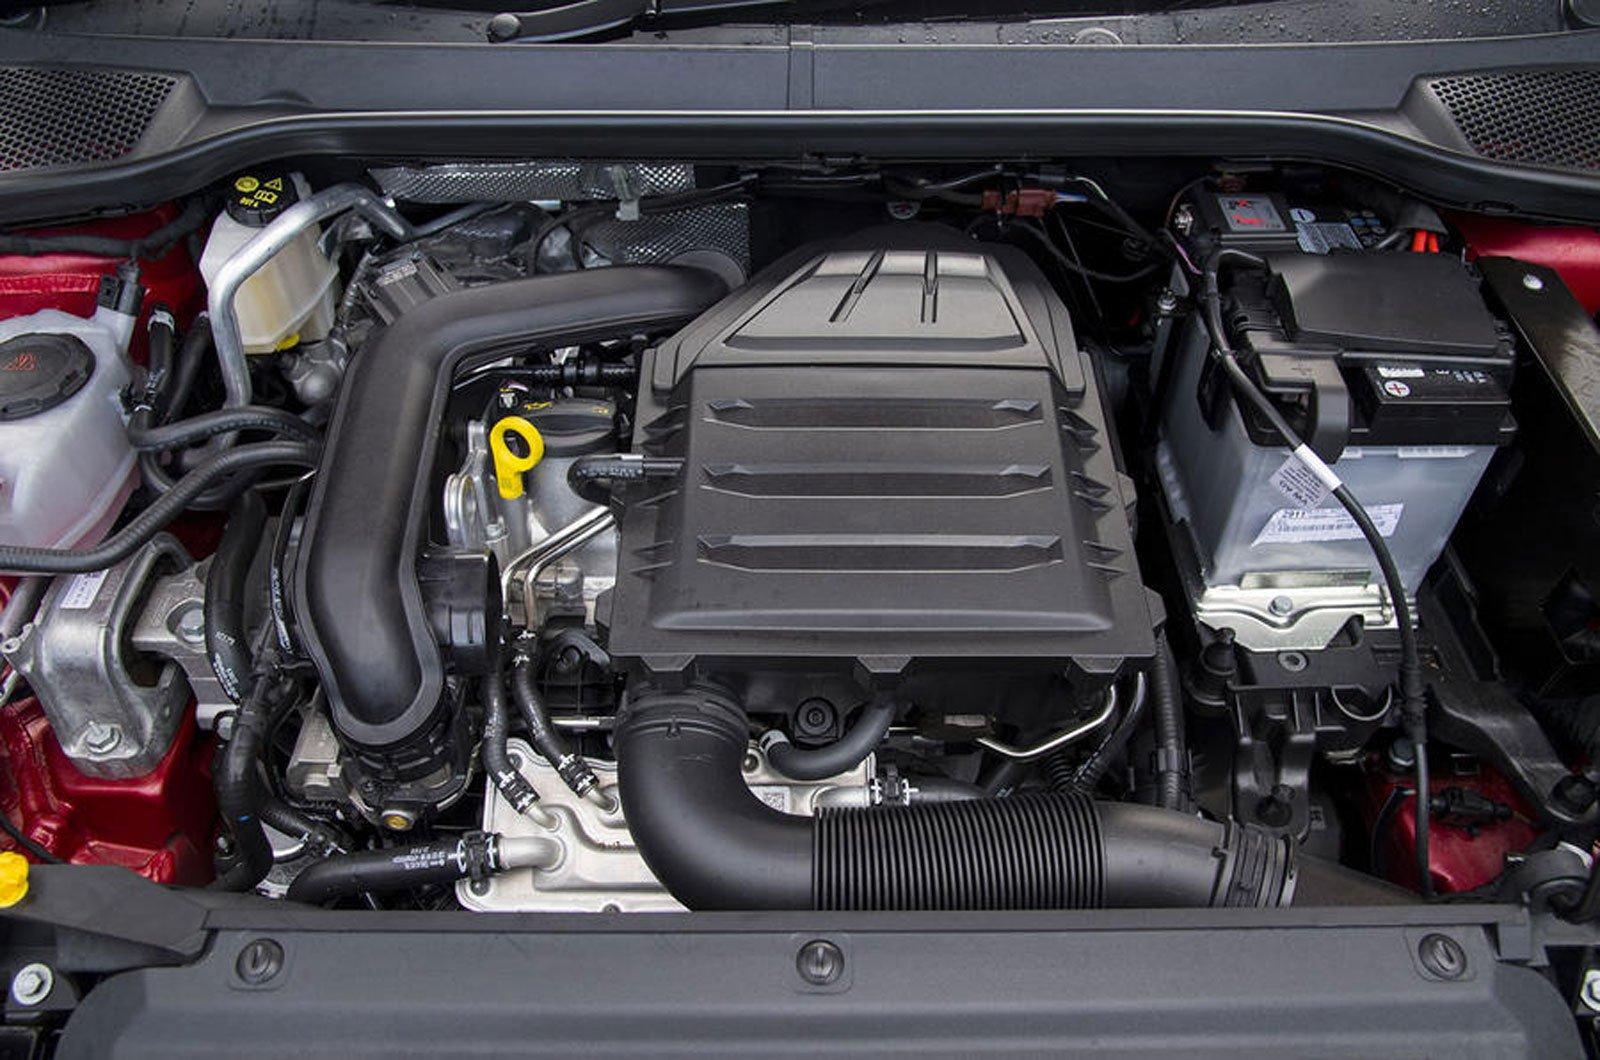 Seat Arona engine